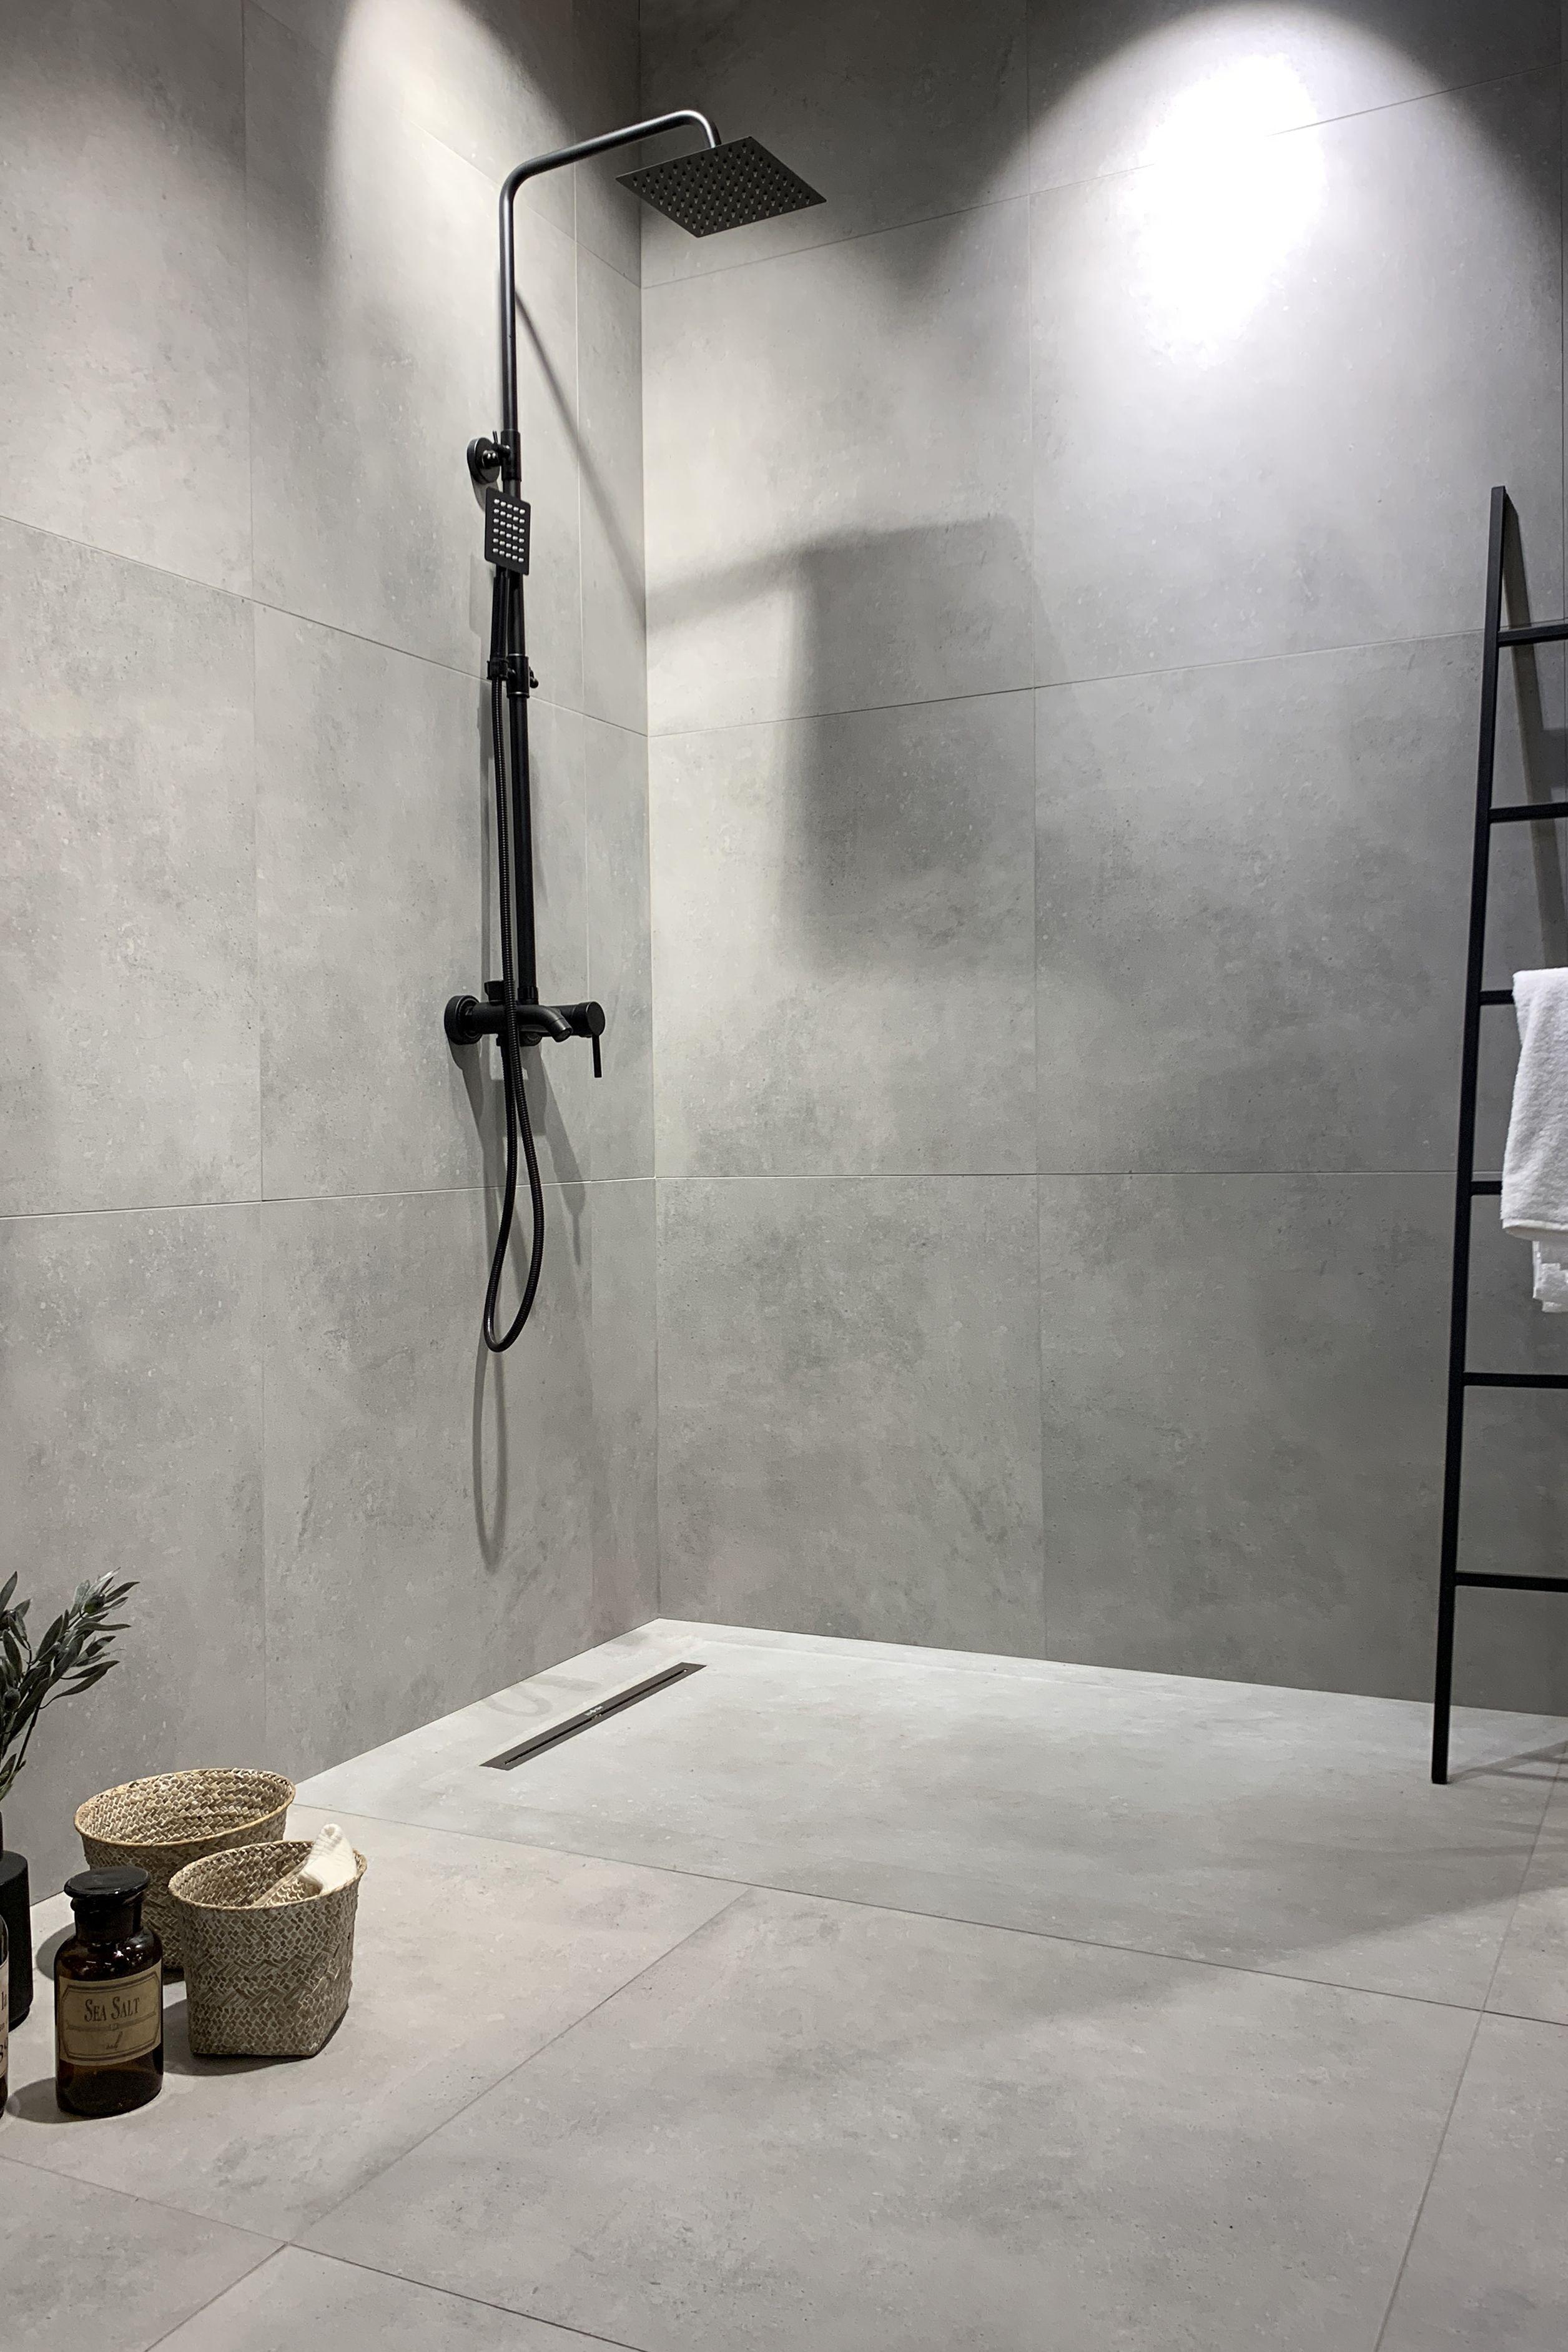 Tilestone Concrete Grey Vloer Impermo Tegels Natuursteen Parket Badkamer Inrichting Badkamer Douchetegel